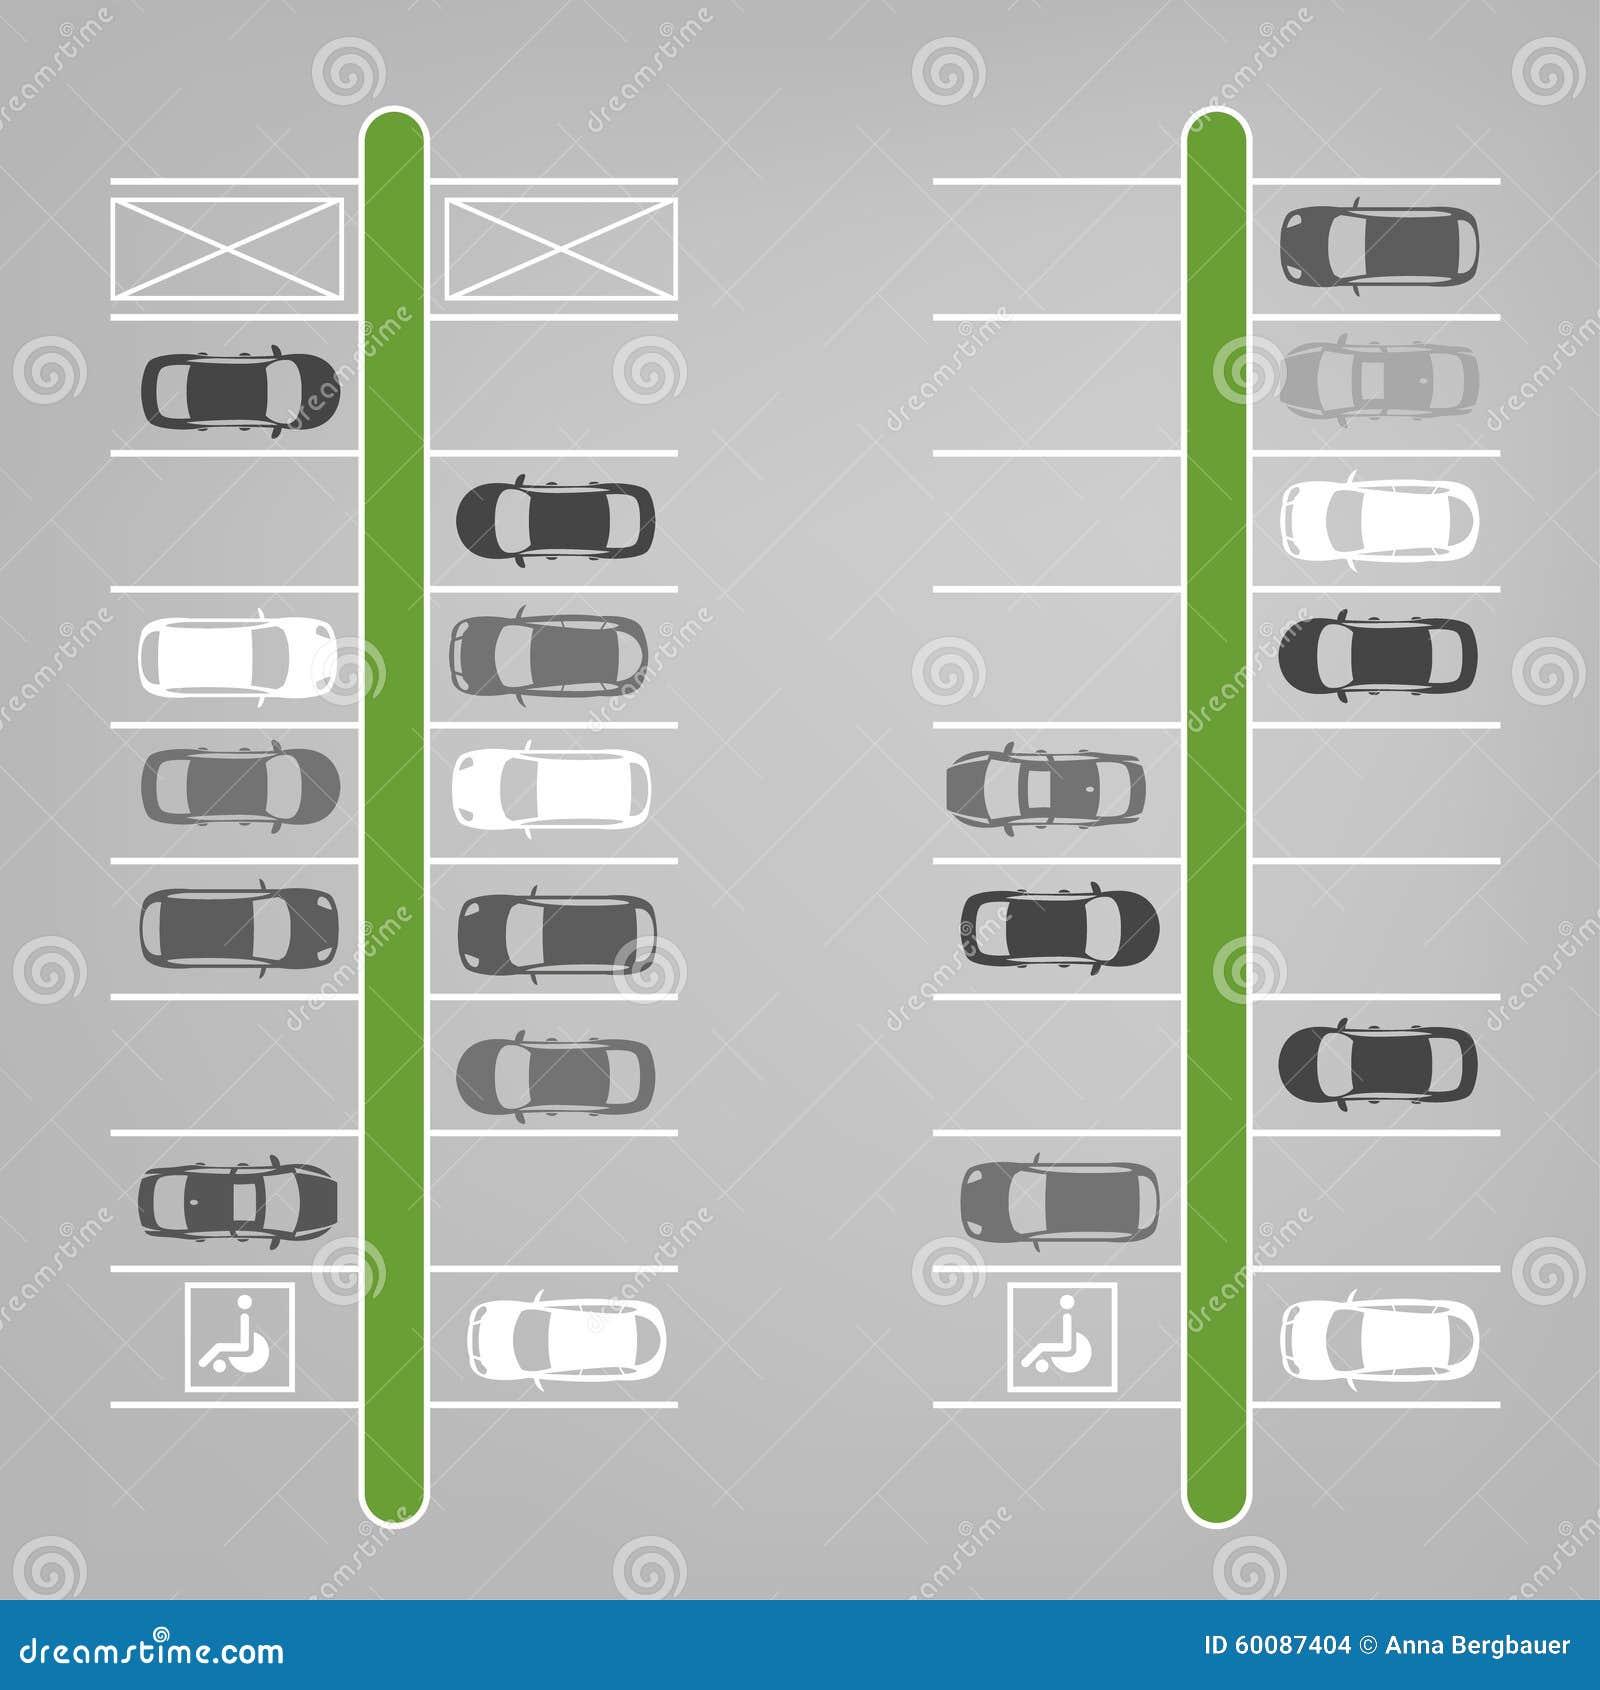 Parking Lot Top View Stock Vector. Illustration Of Sedan